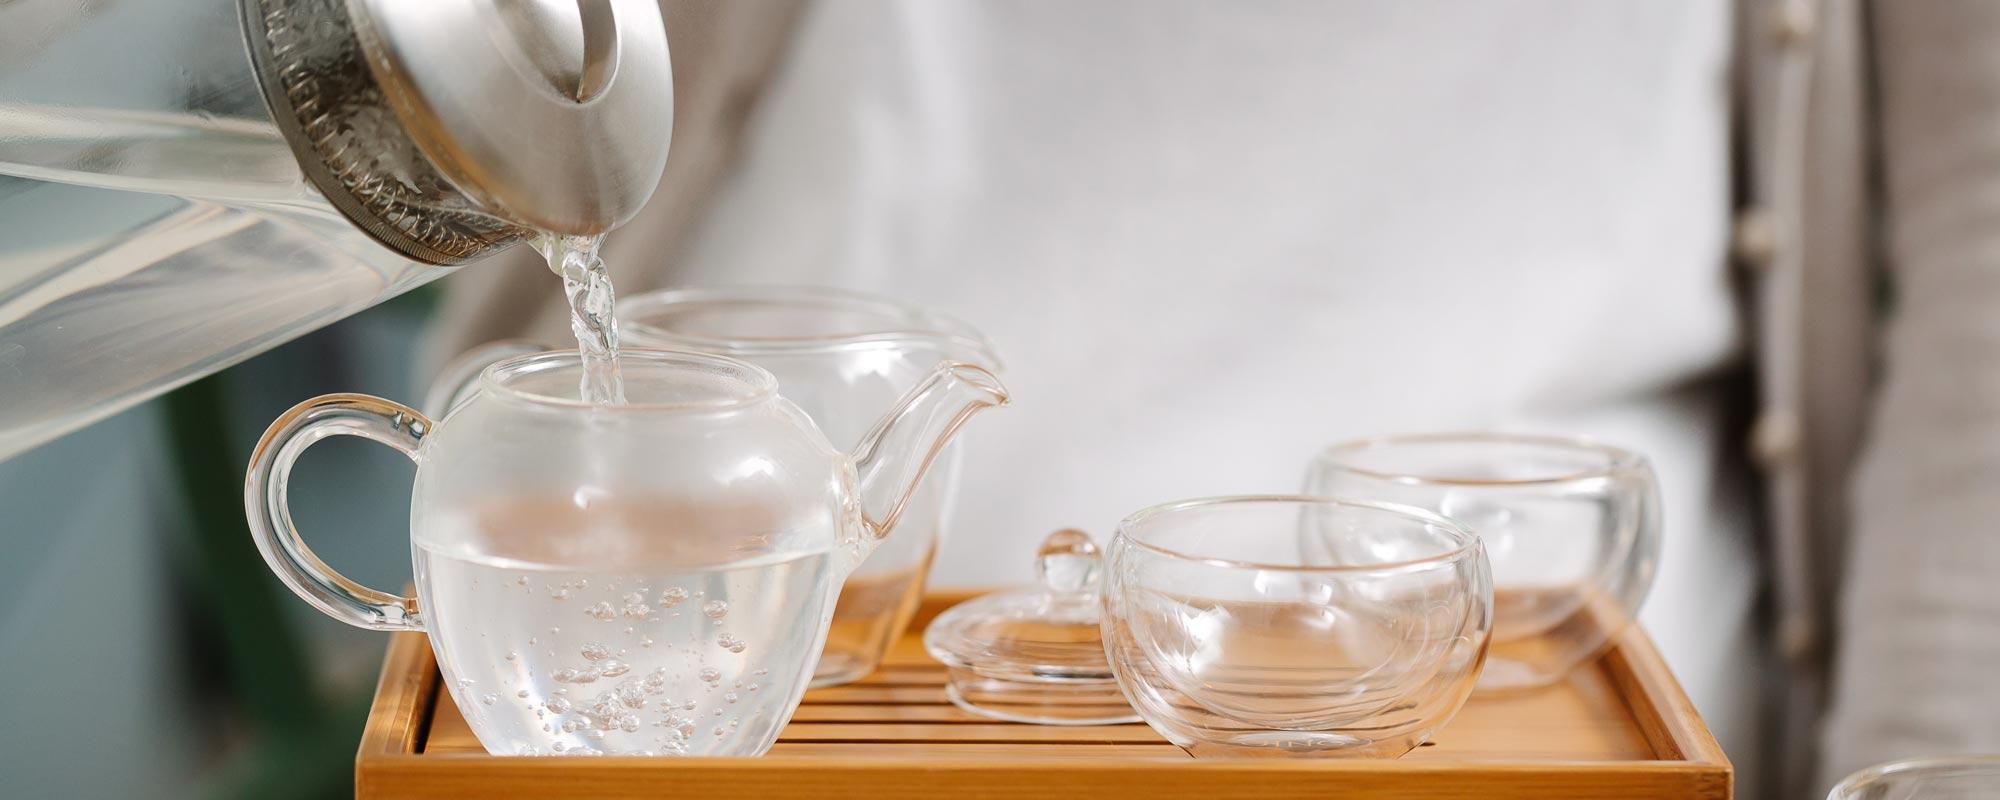 warm-teaware_lifestyle_blog